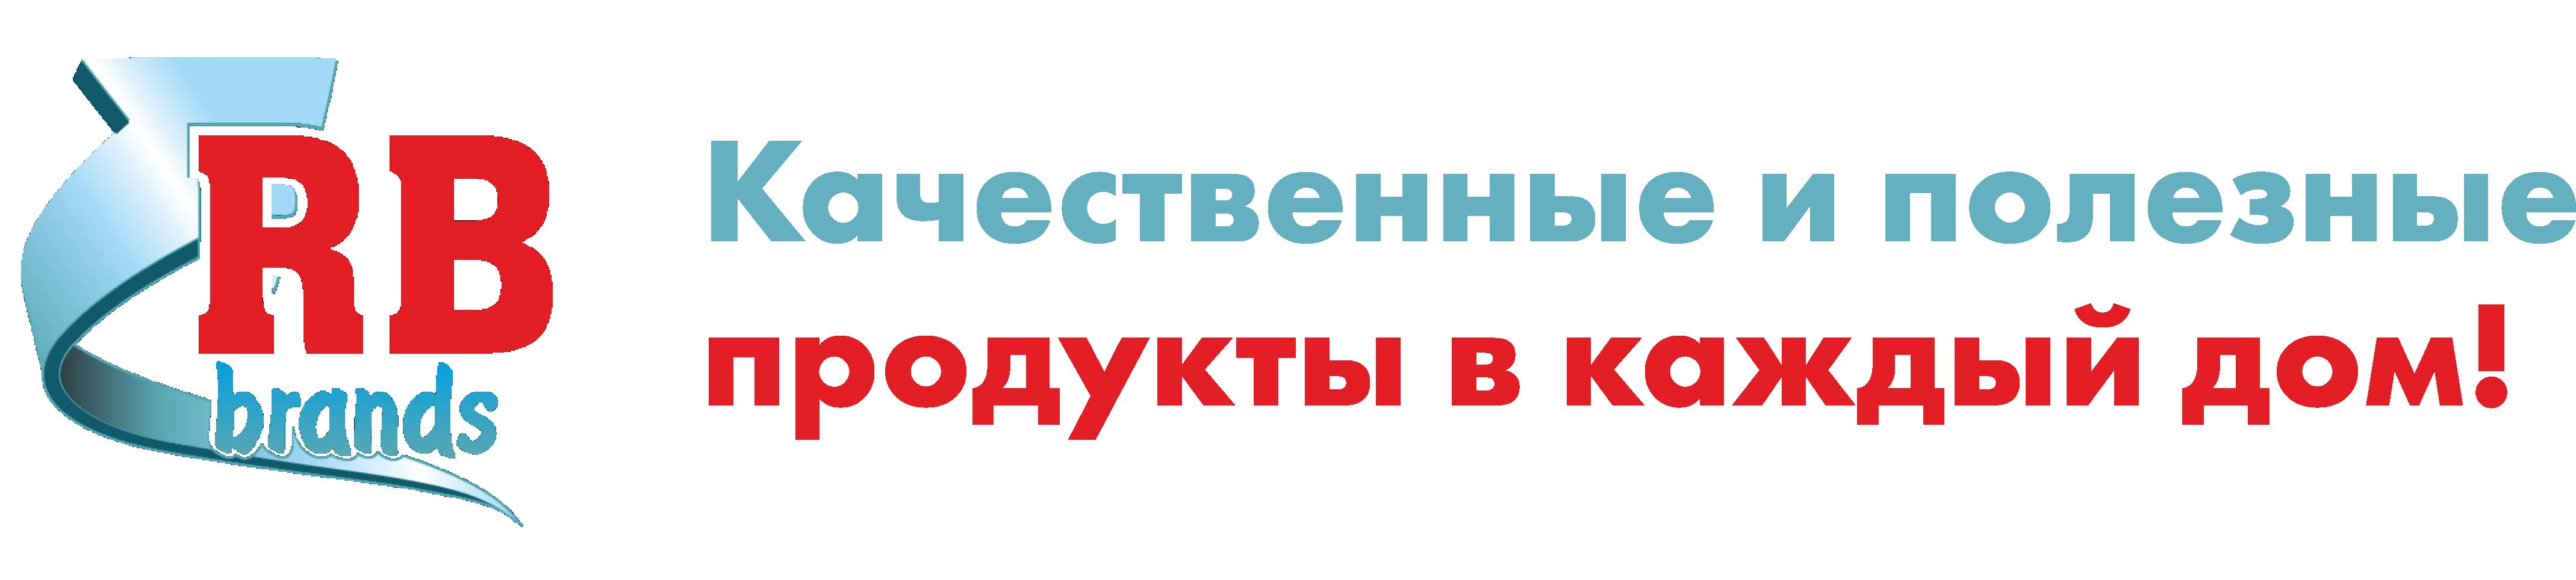 RB Brands